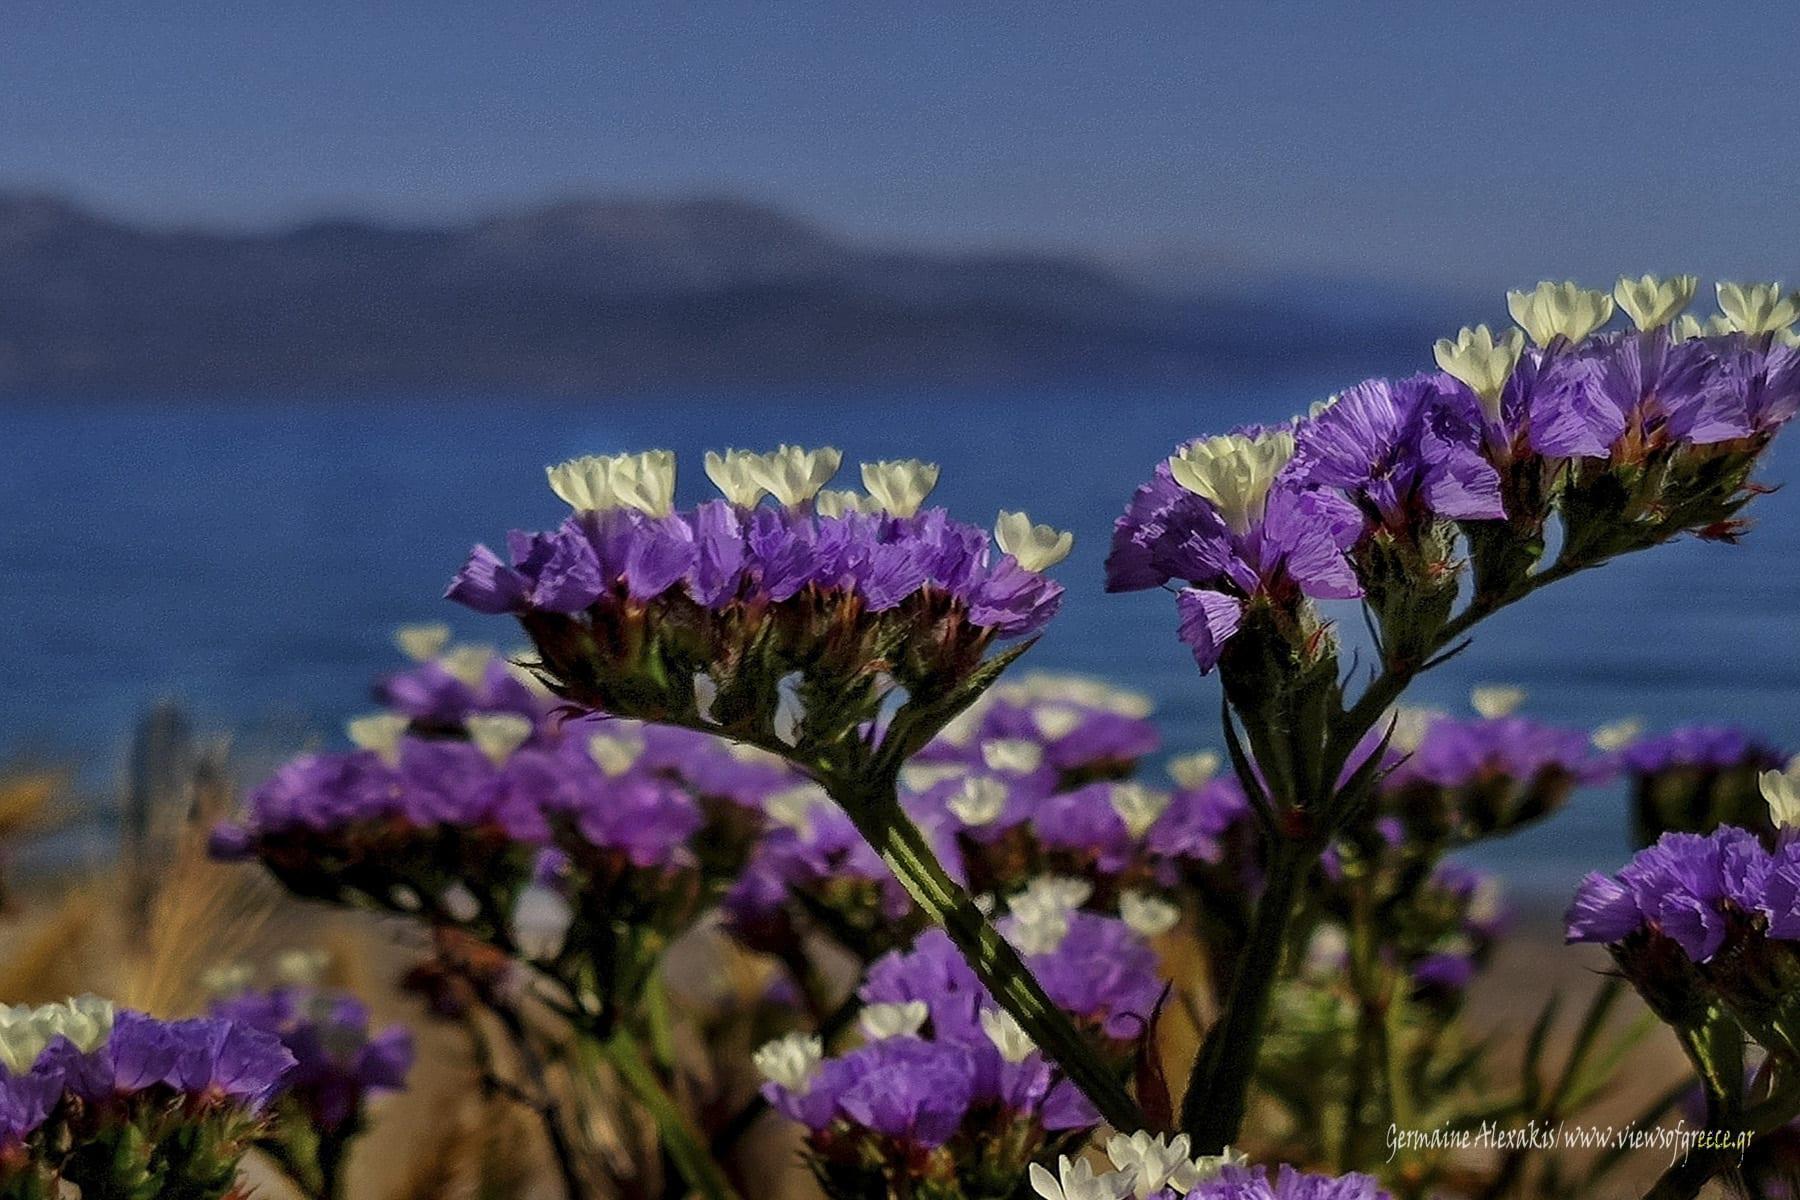 greek , flora, discovergreece, plants, Αμάραντα, flowers, immortal, limonium, bythesea, bytheseaside, purple, endurance, immortelle, everlasting, unfaded, flower, sea, closeup, closeupshot, photography, αμάραντο, Ελληνική χλωρίδα,